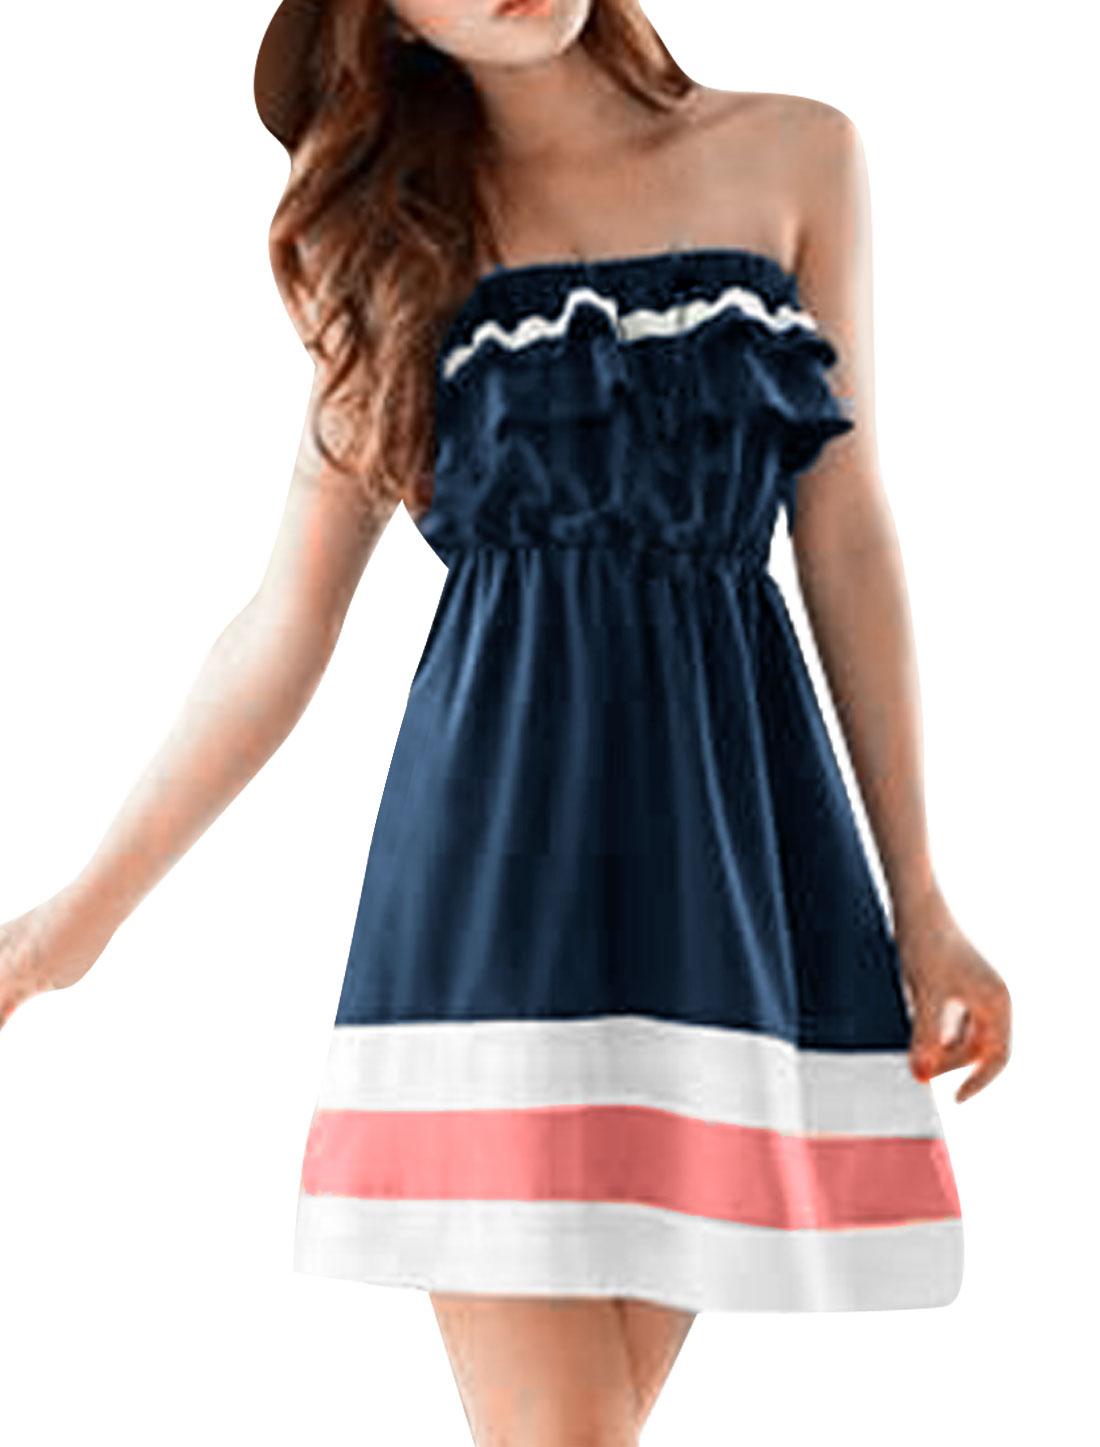 Pullover Strapless Elastic Waist Dark Blue Tube Dress XL for Lady